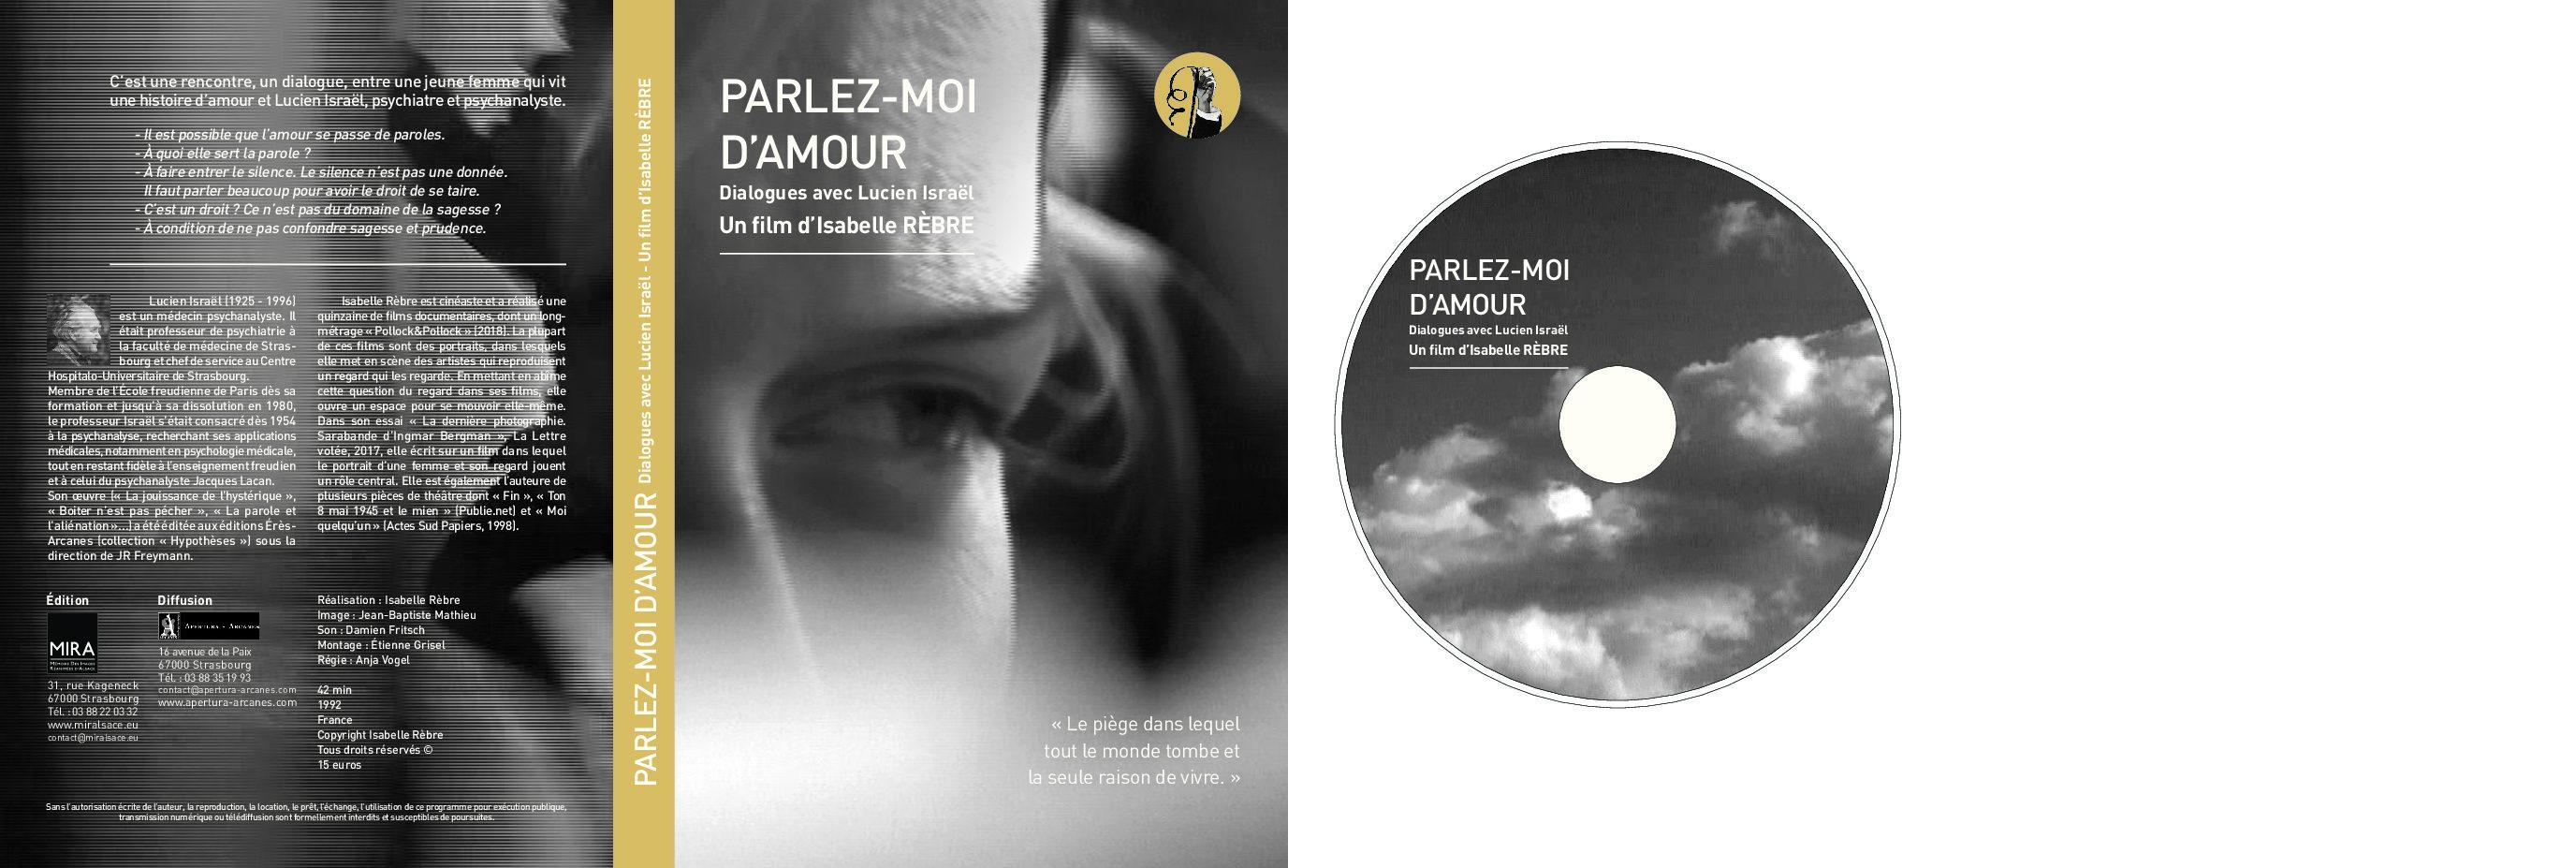 mira_dvd_pochette_v6